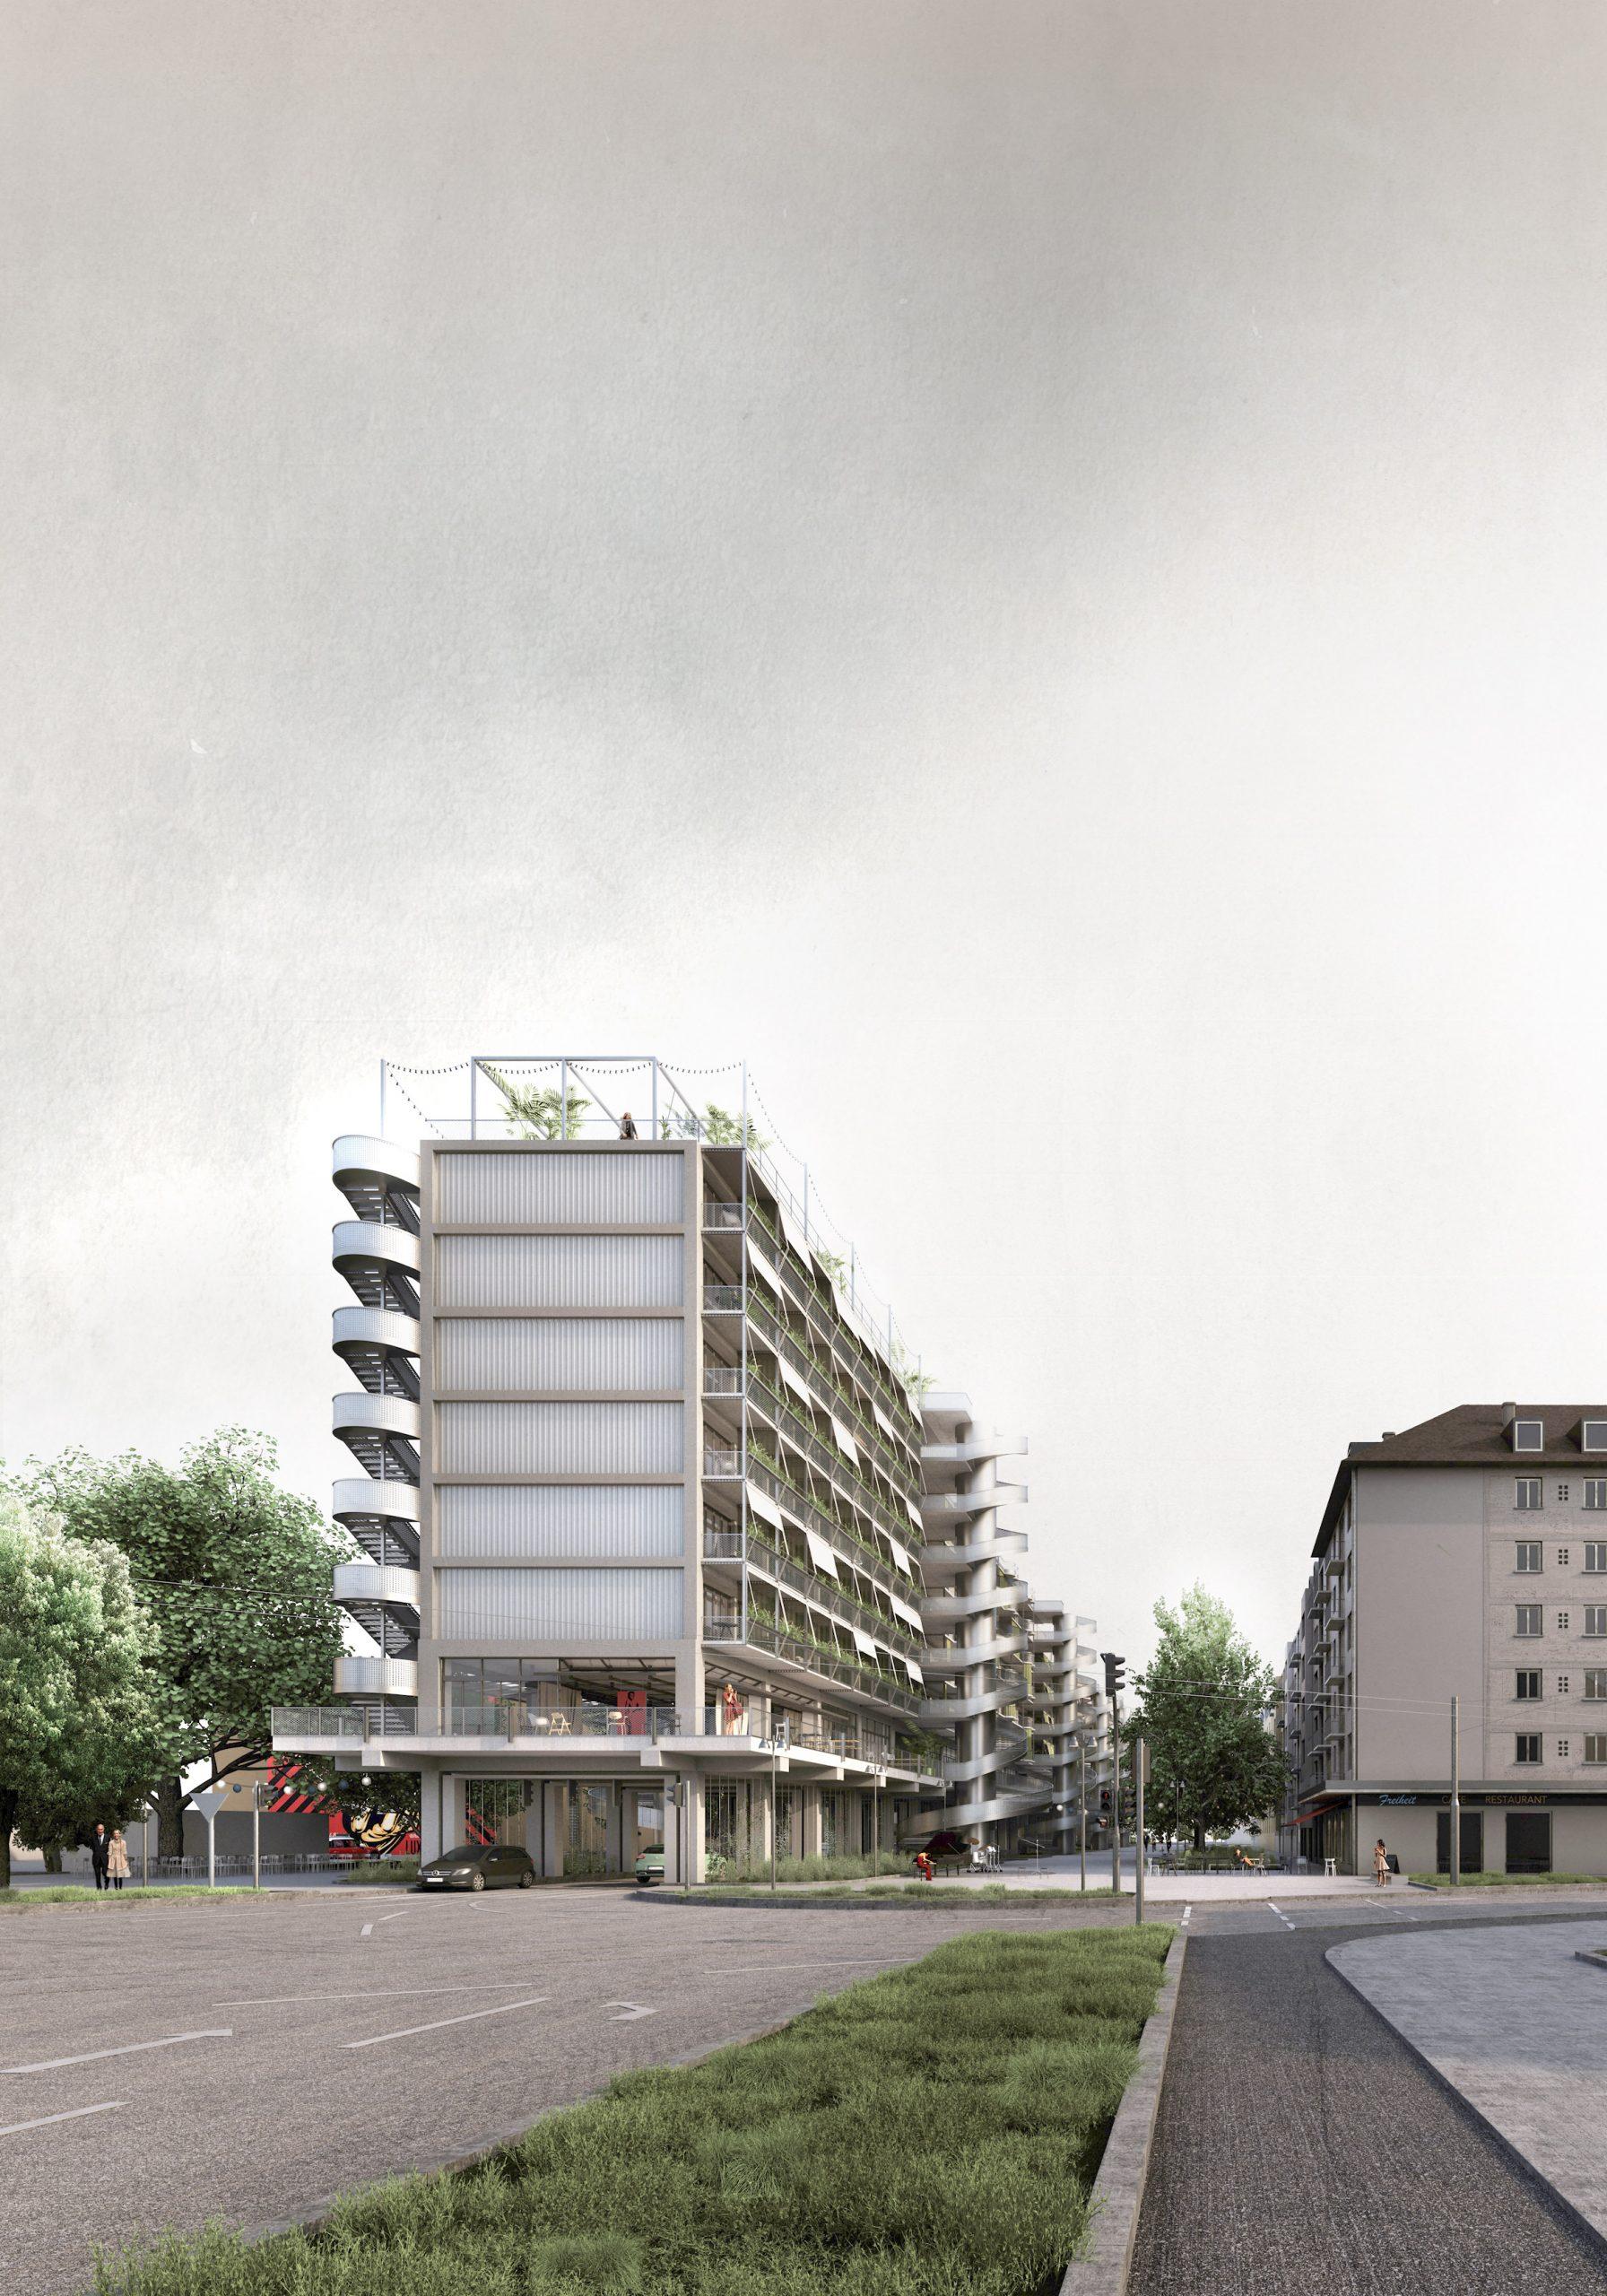 Technical University Munich students share adaptive reuse projects